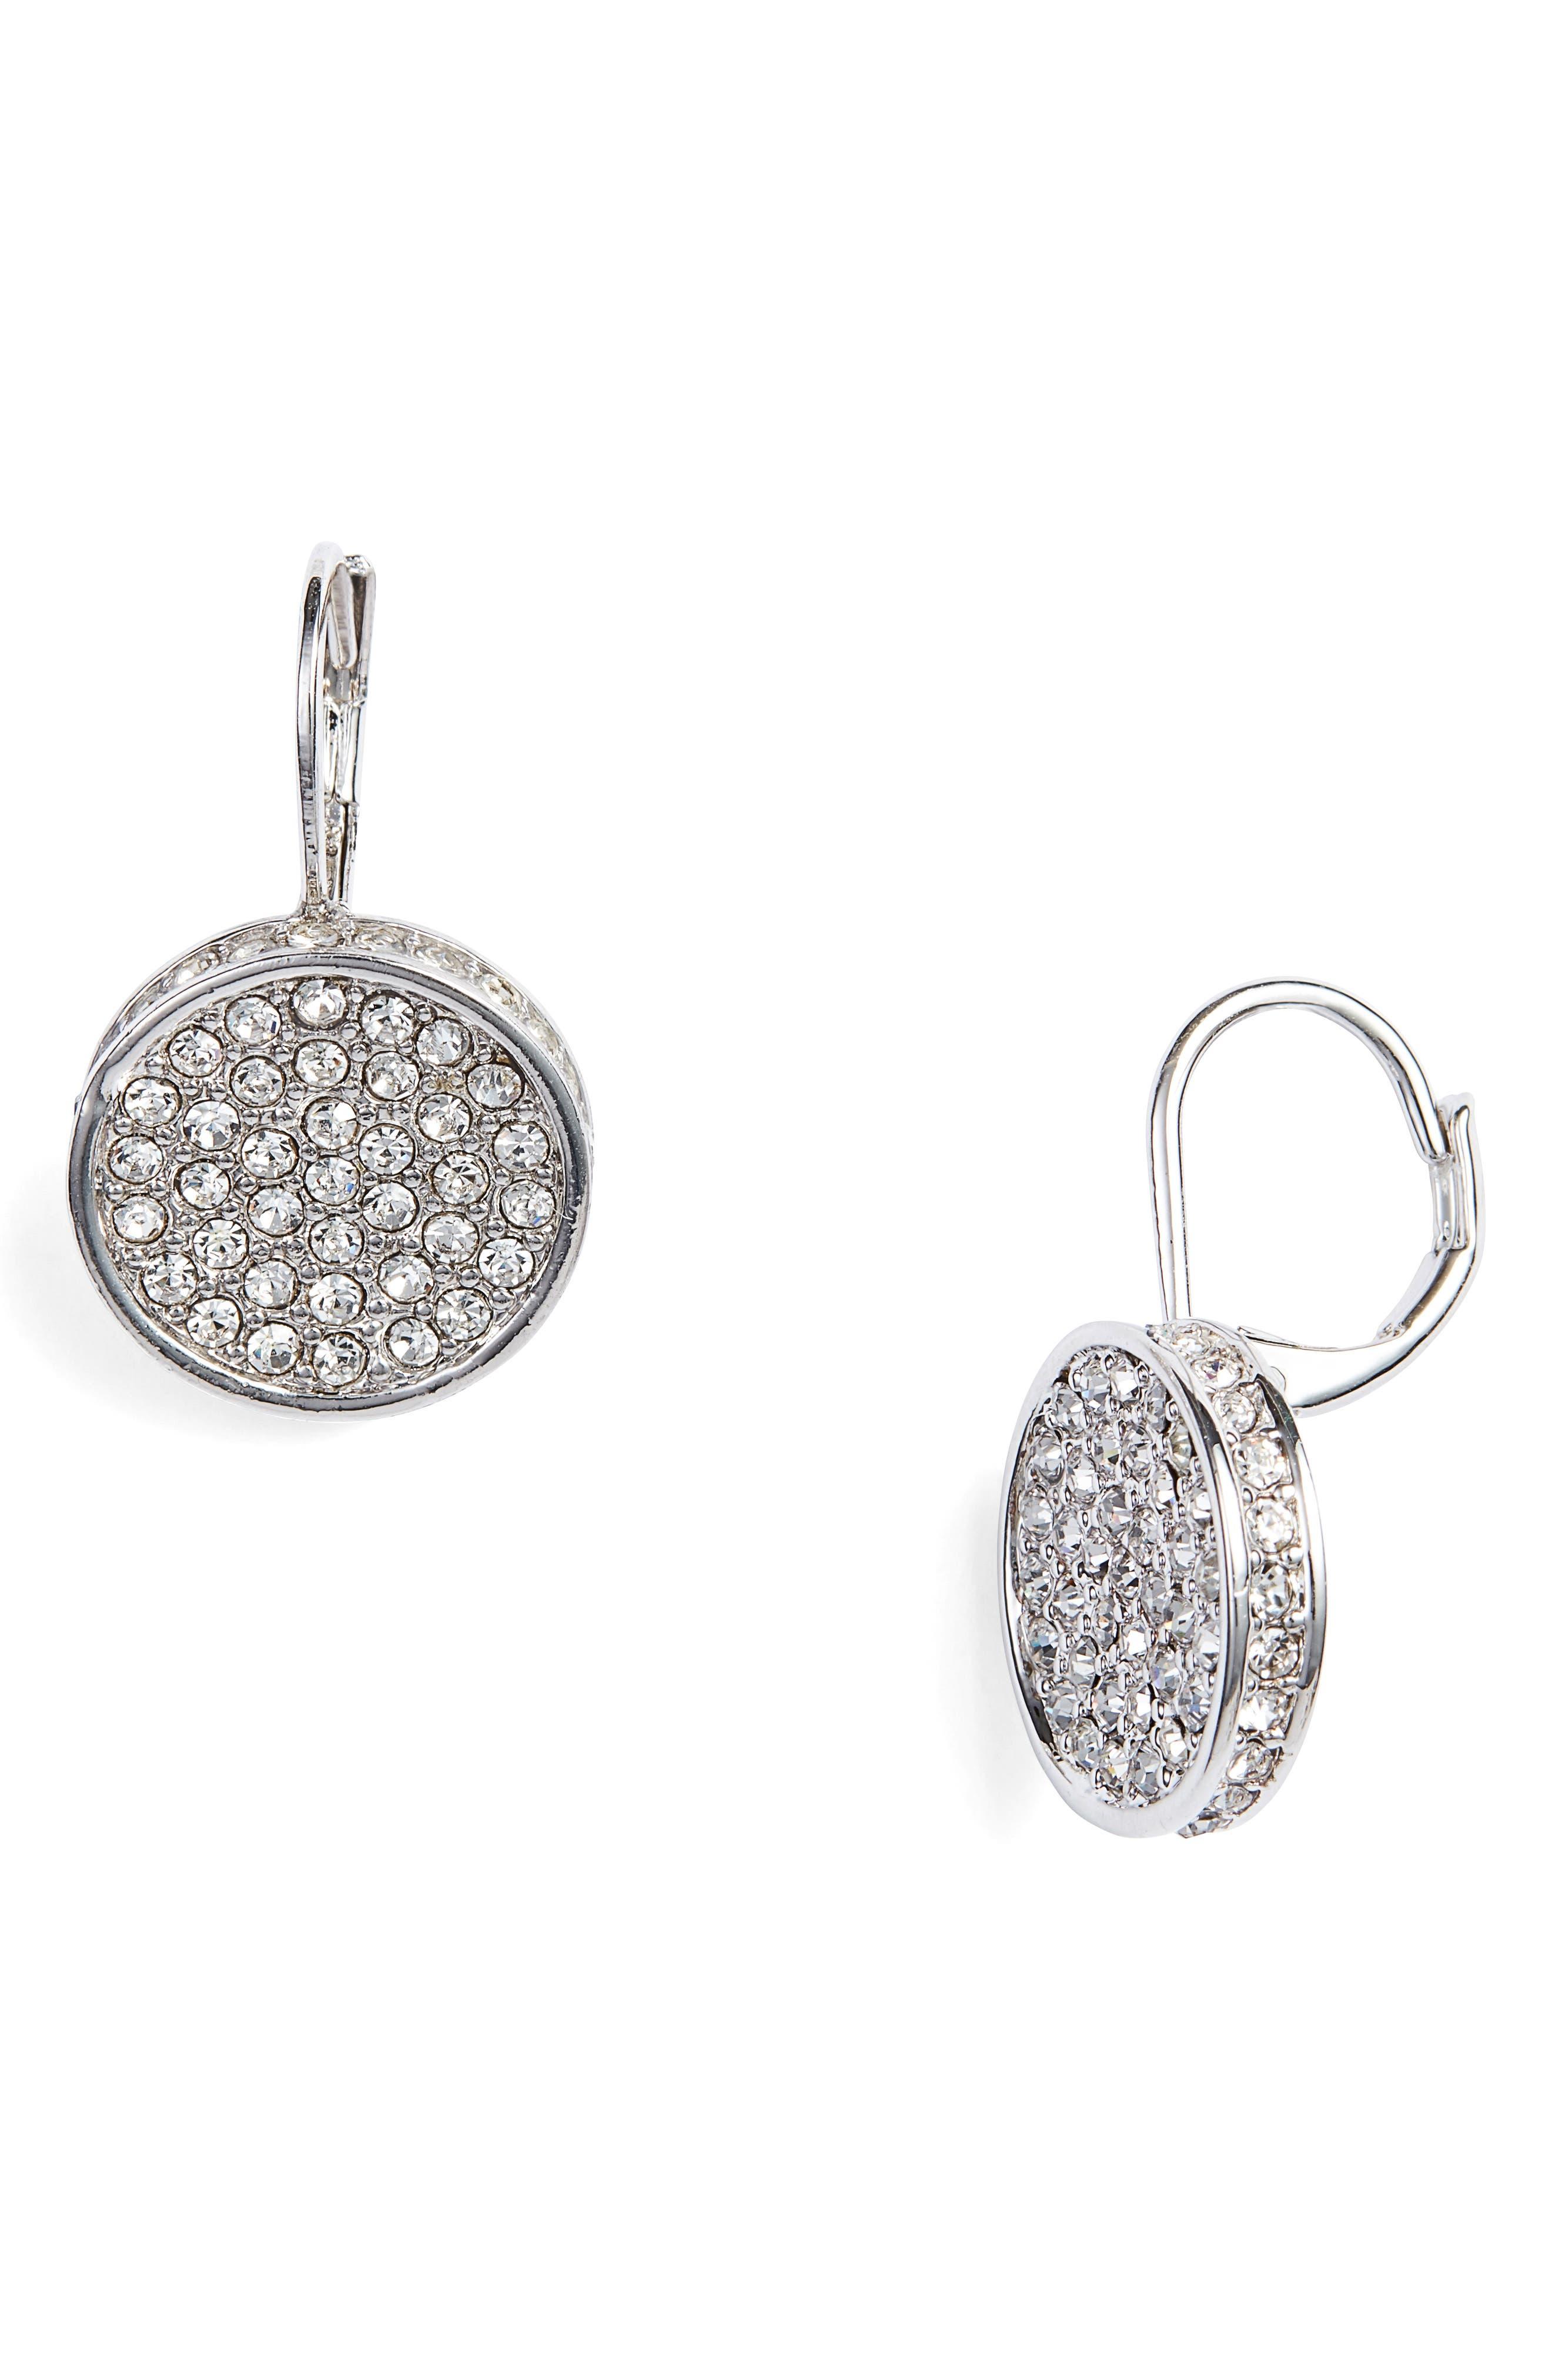 Crystal Glitter Earrings,                             Main thumbnail 1, color,                             Silver/ Crystal